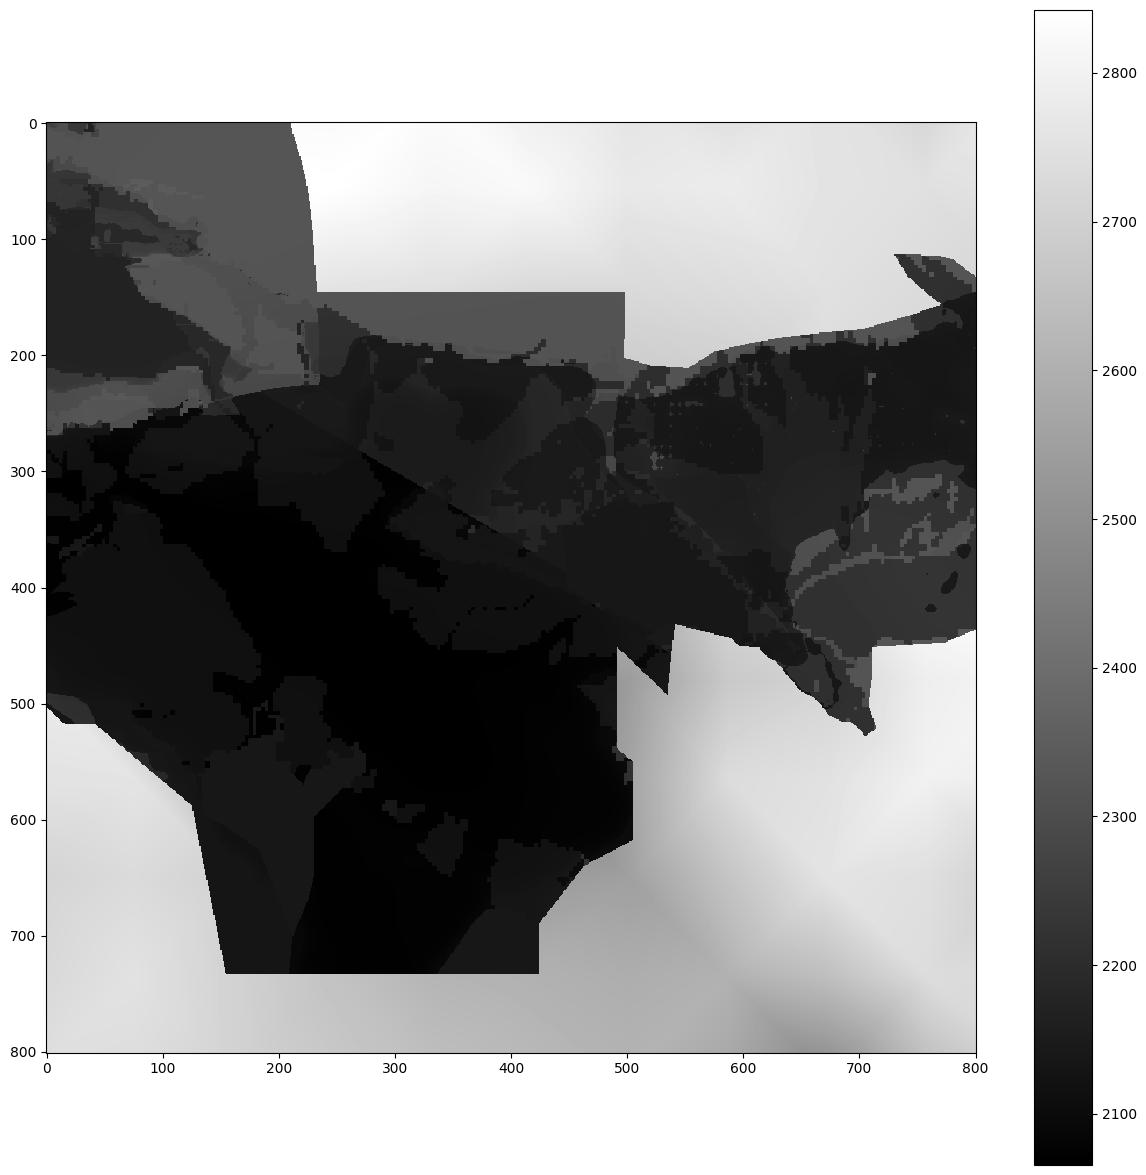 bench/seismic/wp/la_habra/meshes/velocity_model/plots/rho_100.png